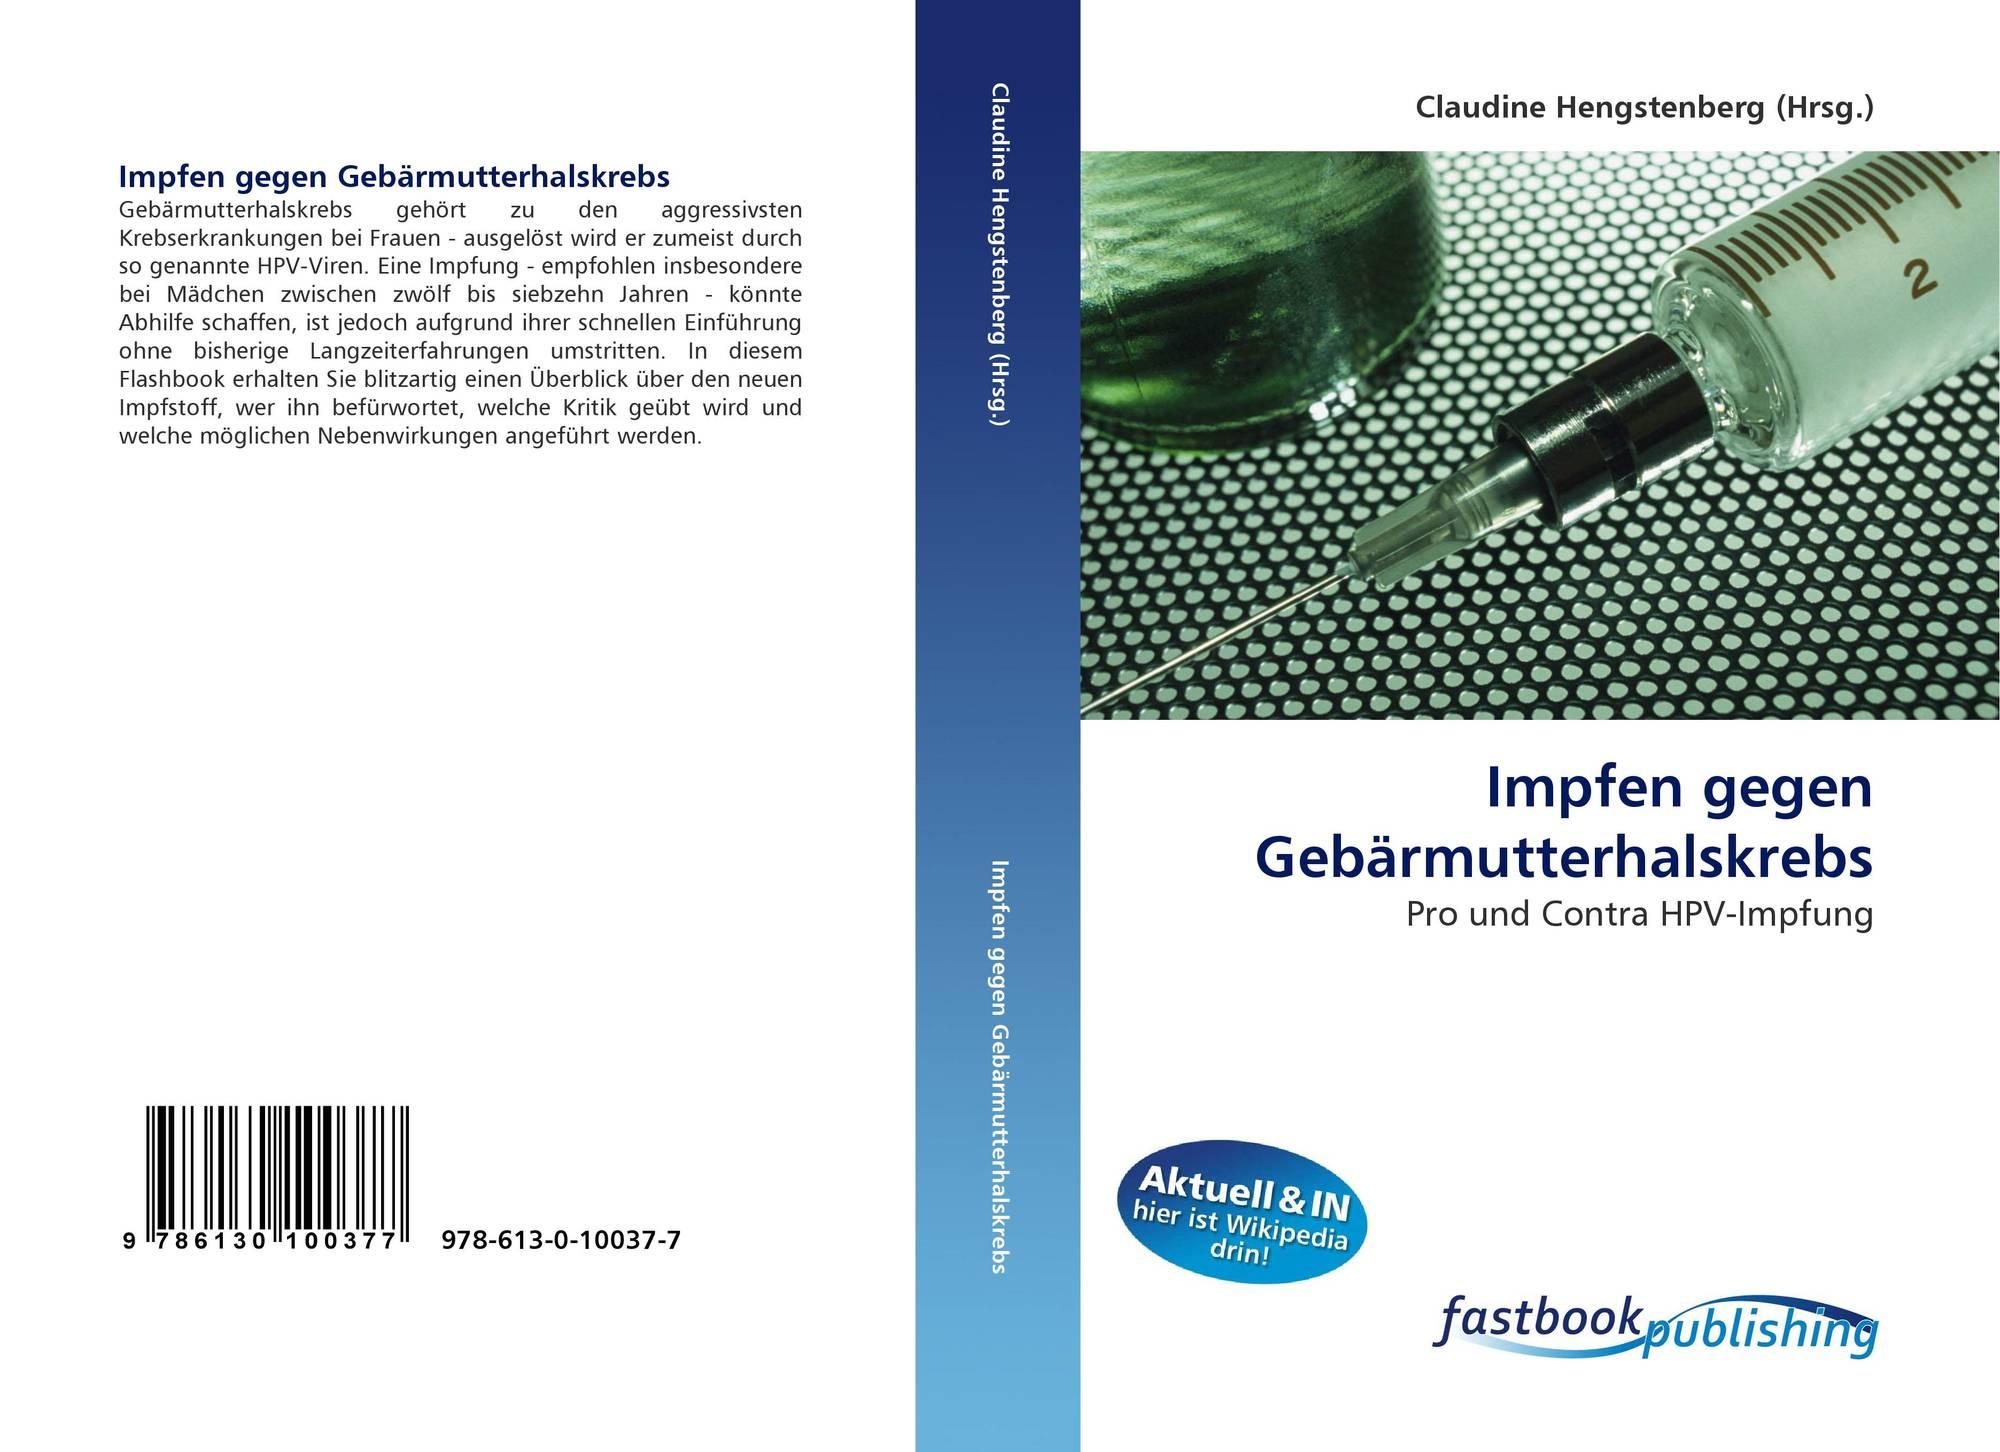 Hpv impfung pro kontra. Papilloma impfung